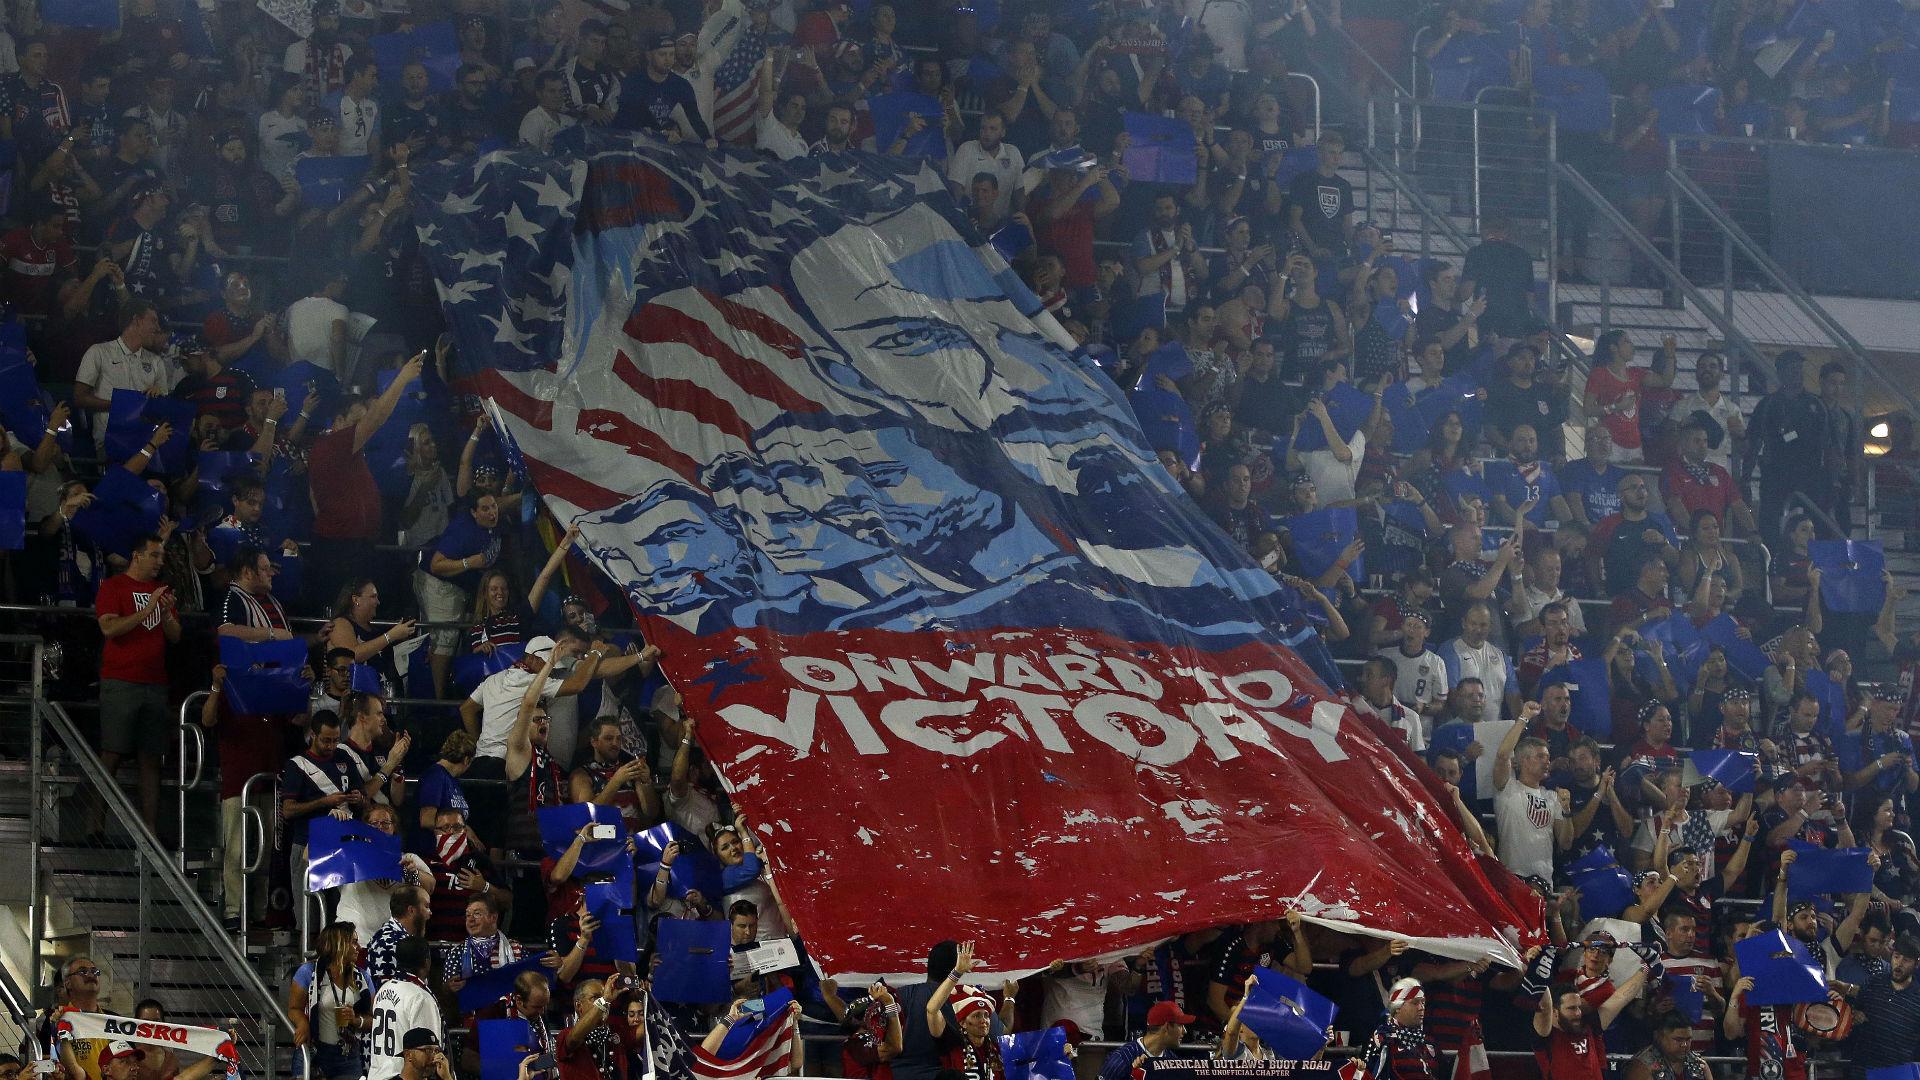 USA fans in Orlando